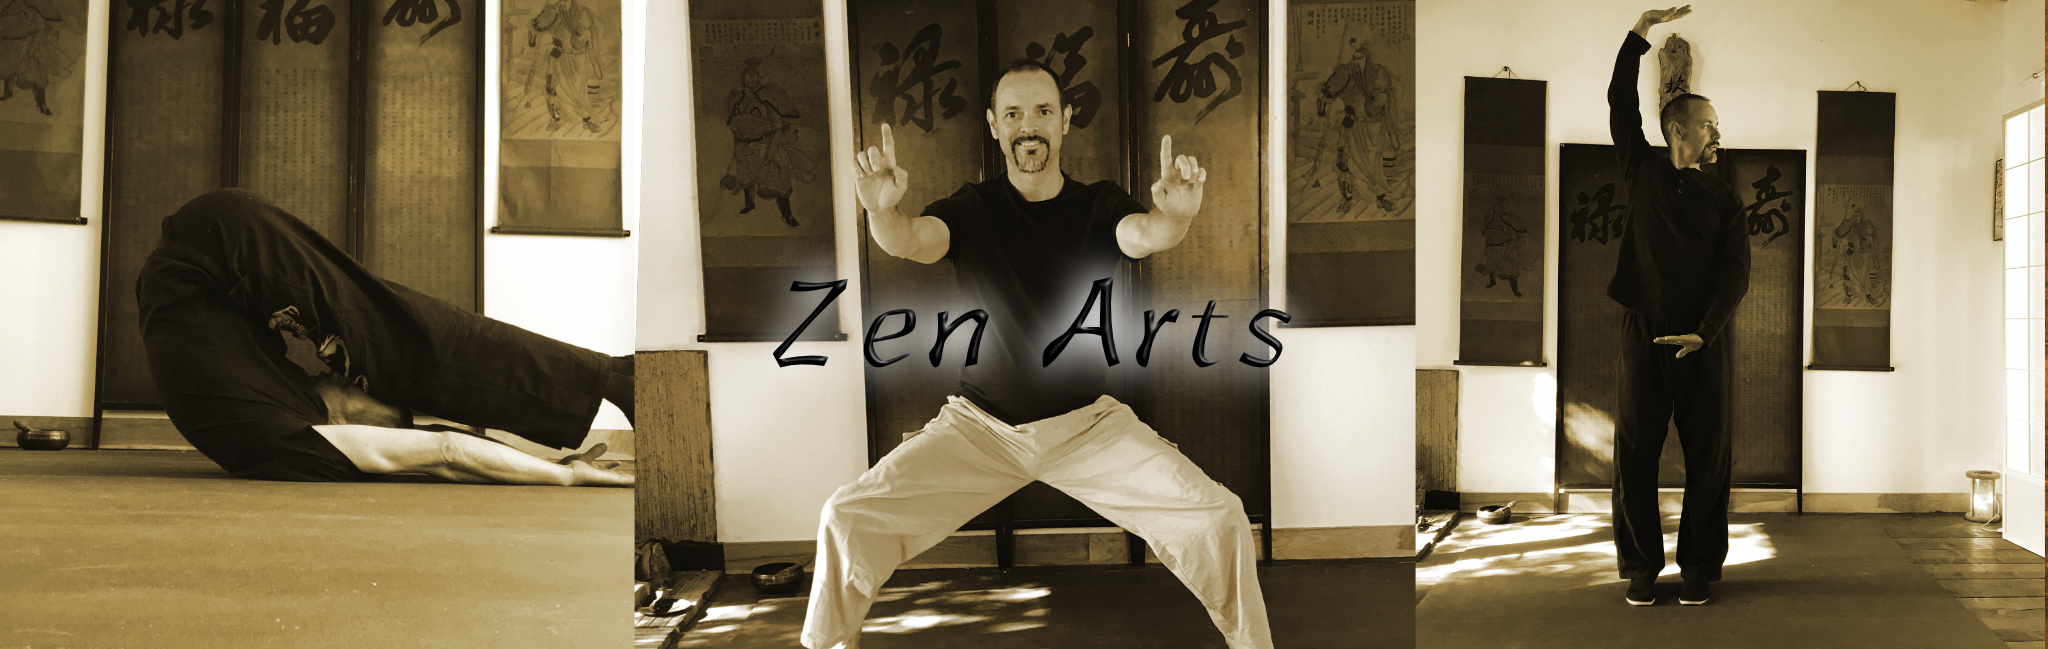 Shaolin Arts, Tai Chi, Qigong, Yoga, Therapy